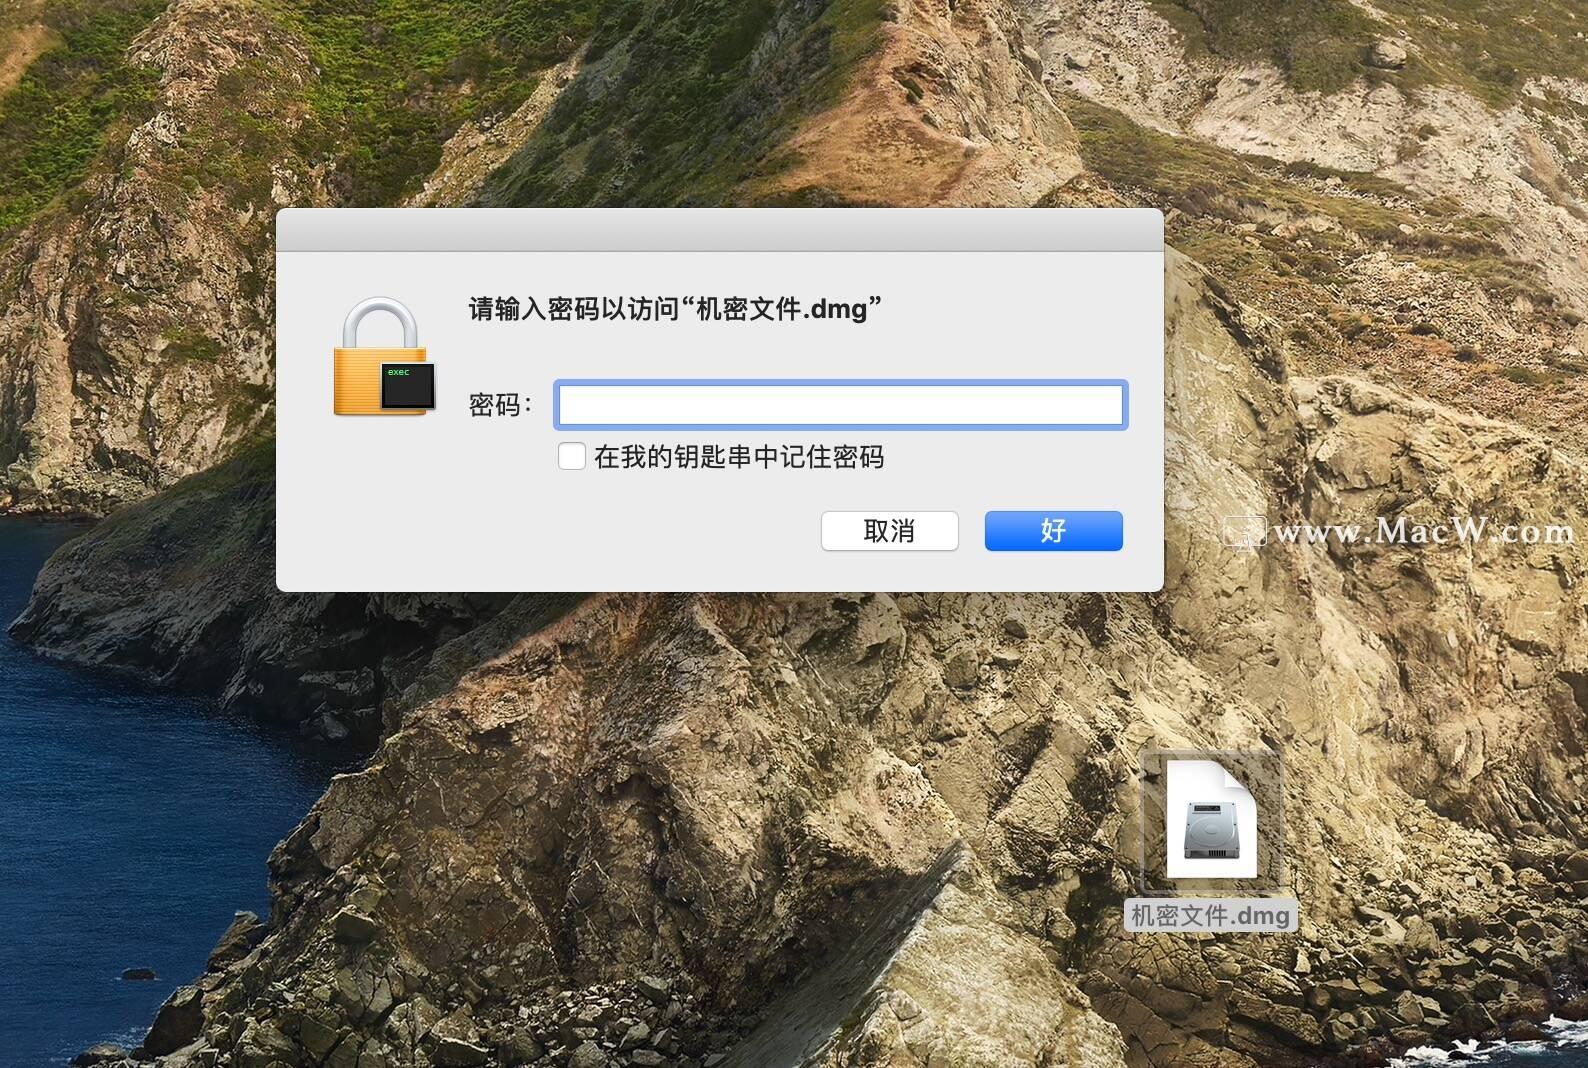 macw资讯:MacOS如何隐藏、加密文件或文件夹